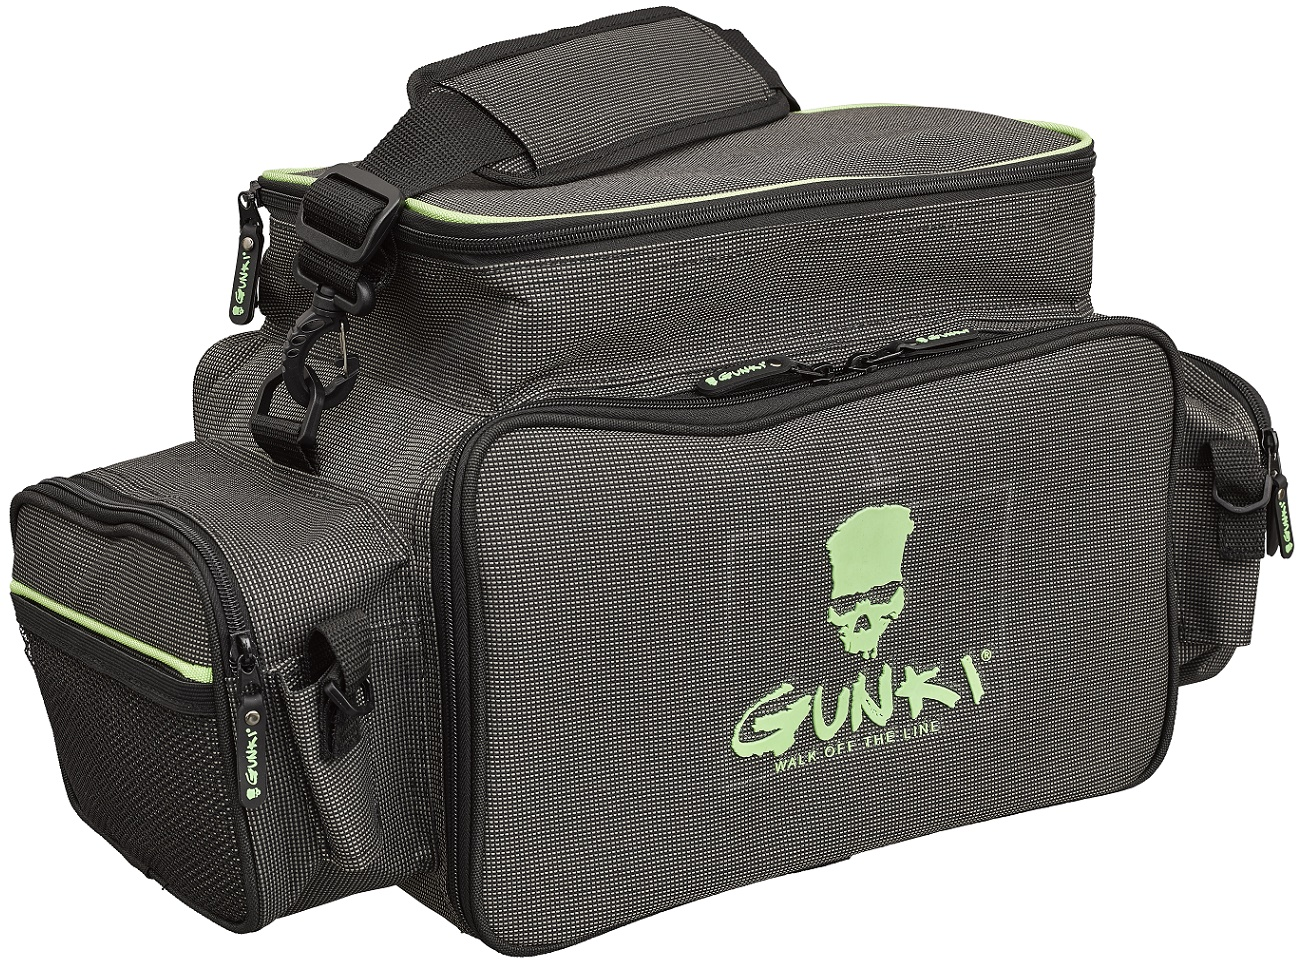 Iron-T Box Bag Front-Pike Pro (taška)